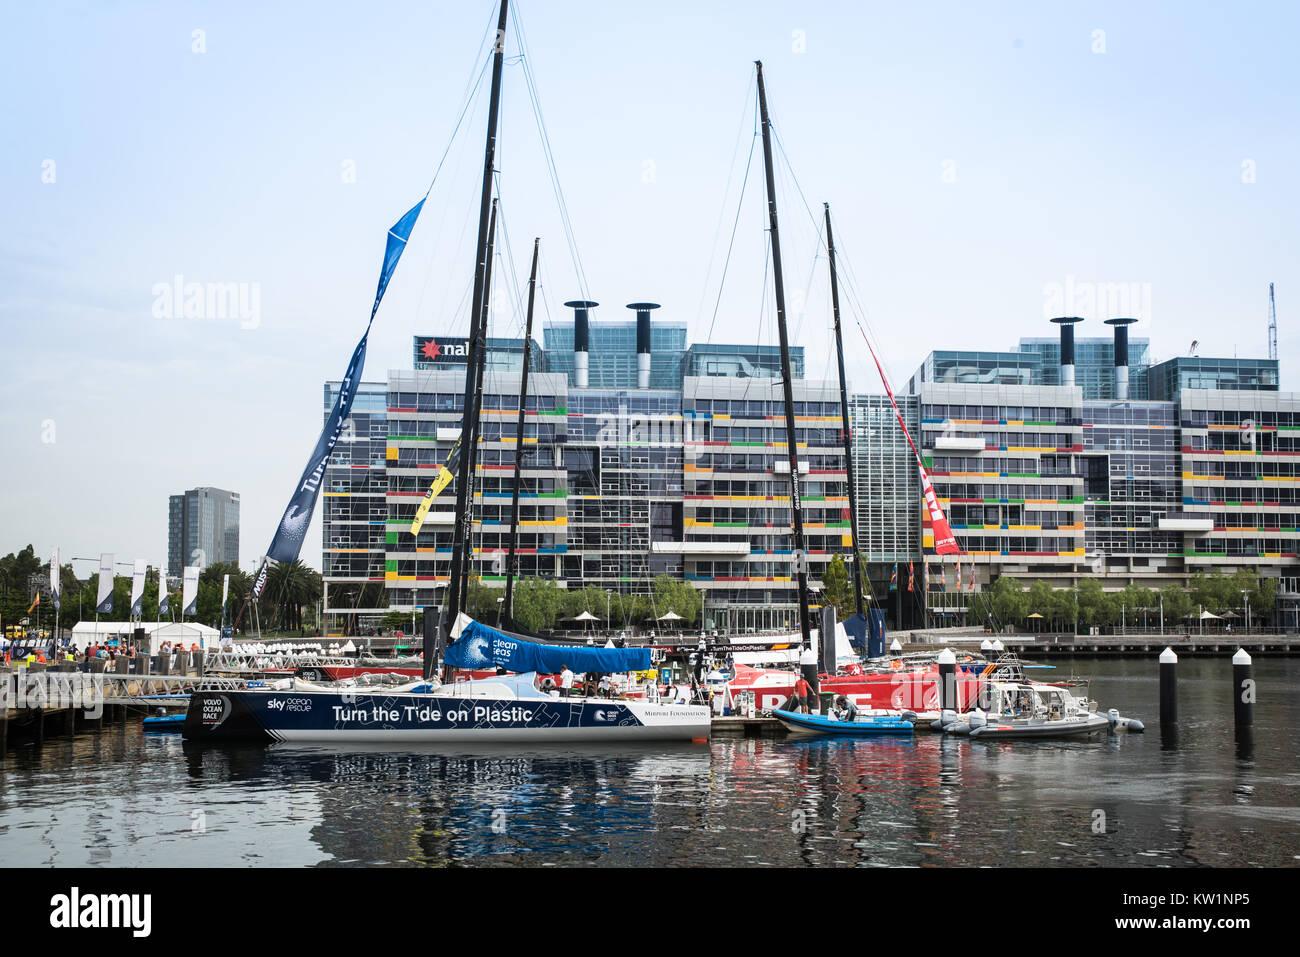 Yachts Docked in Docklands Melbourne, Volvo Ocean Race - Stock Image